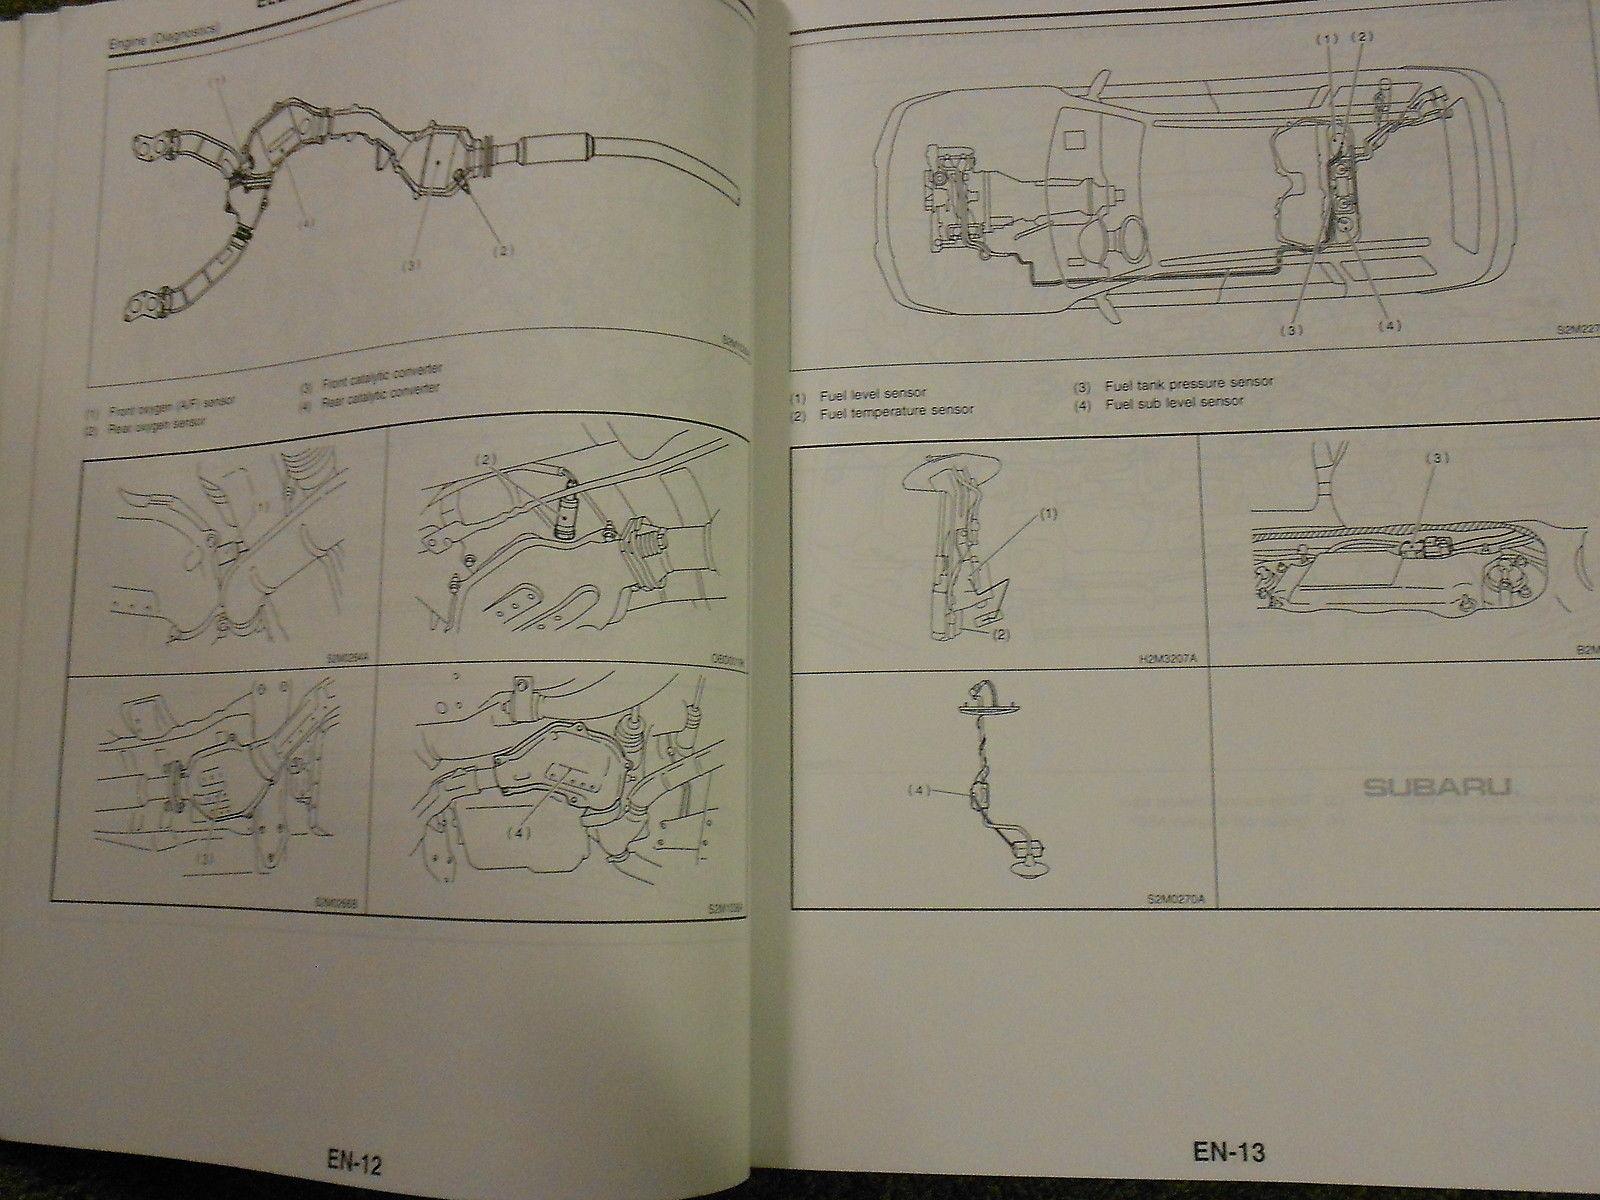 2002 Subaru Forester Engine Diagnostic Supplement Service Repair Shop Manual OEM